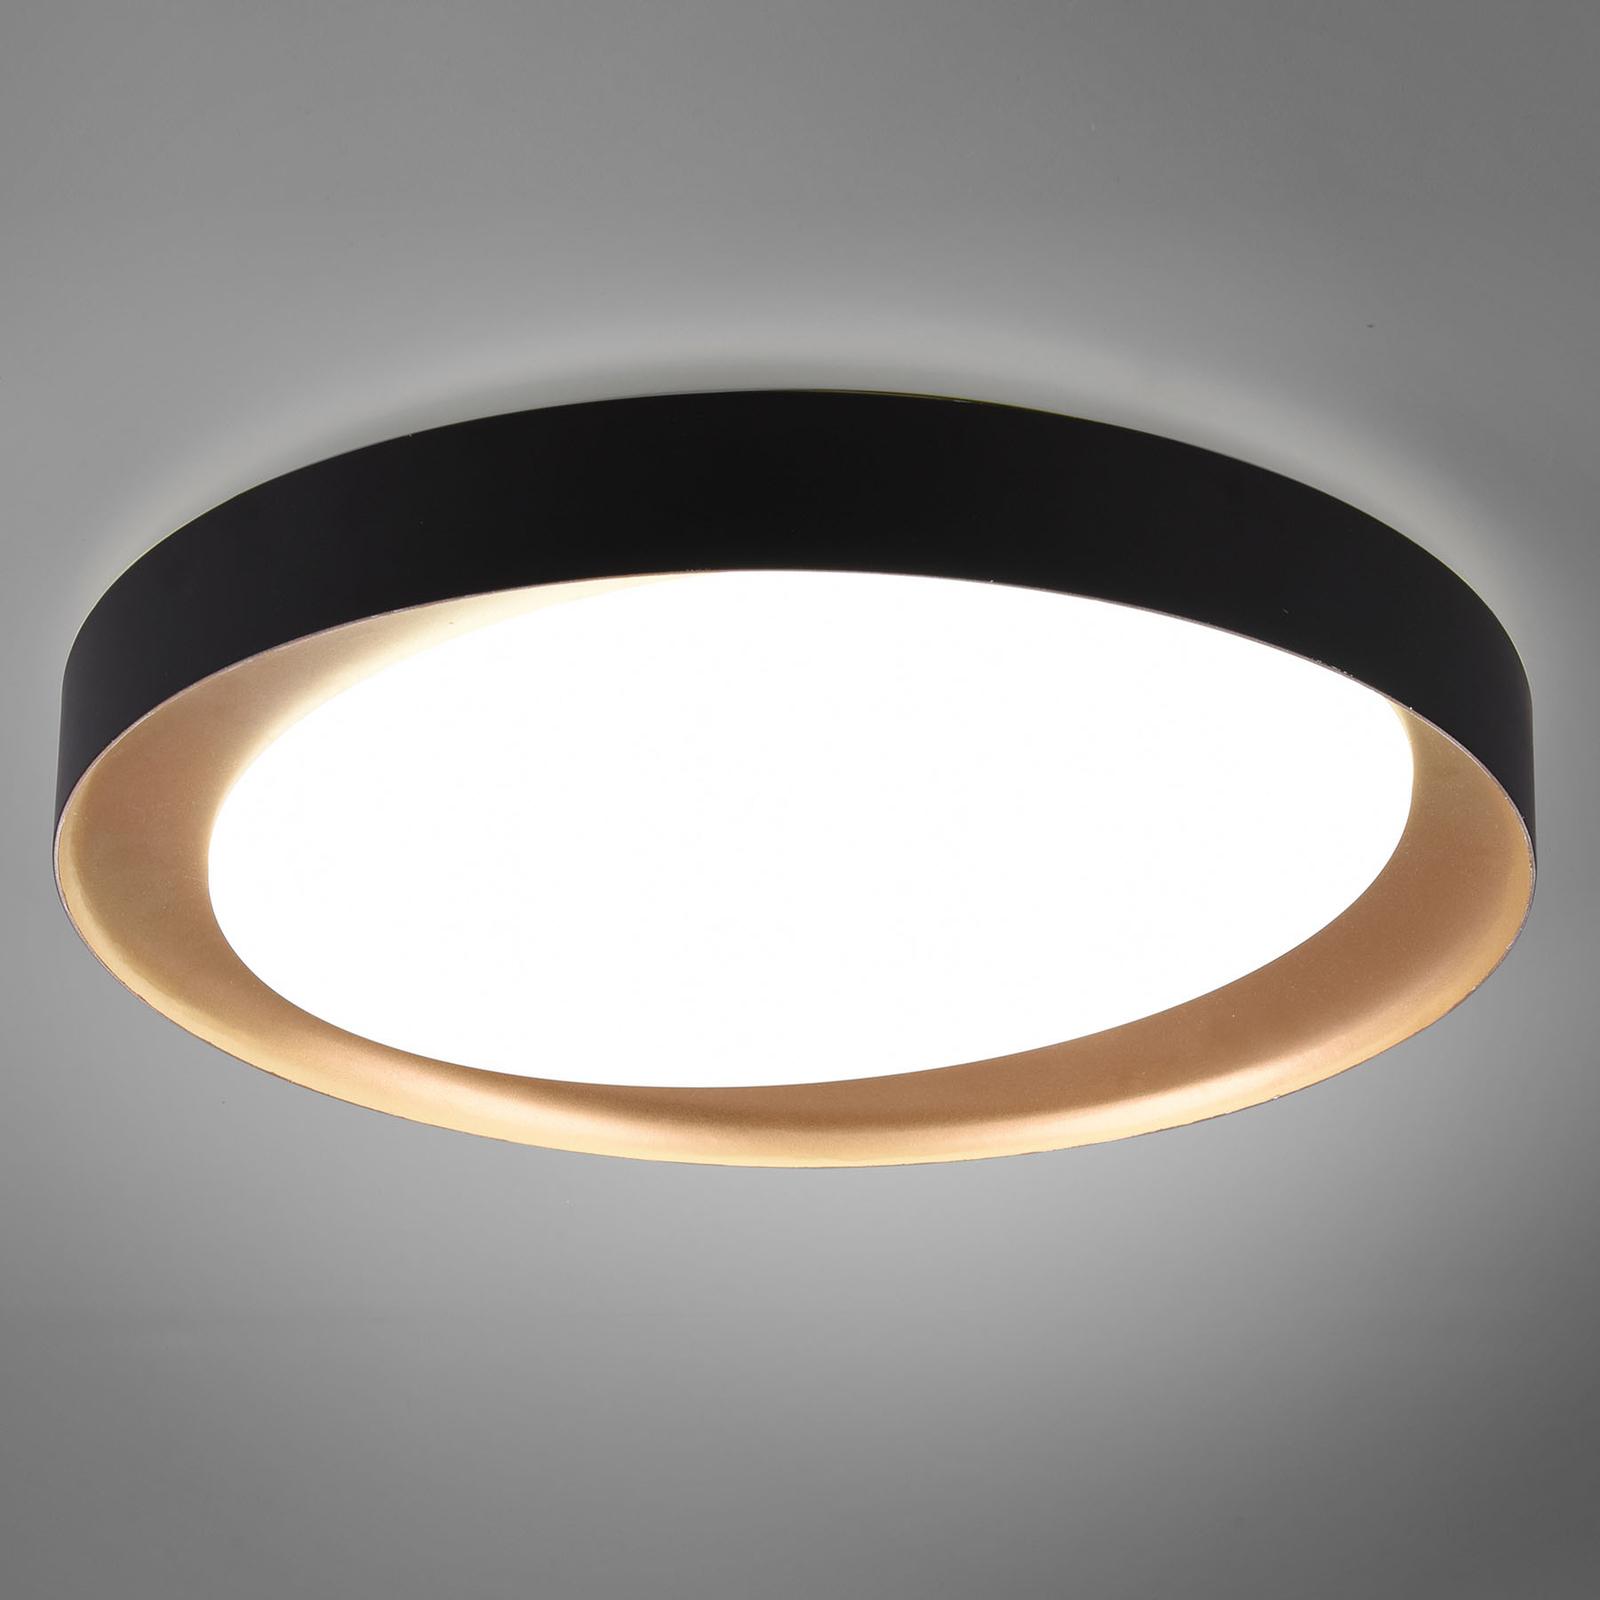 LED-taklampe Zeta tunable white, svart/gull